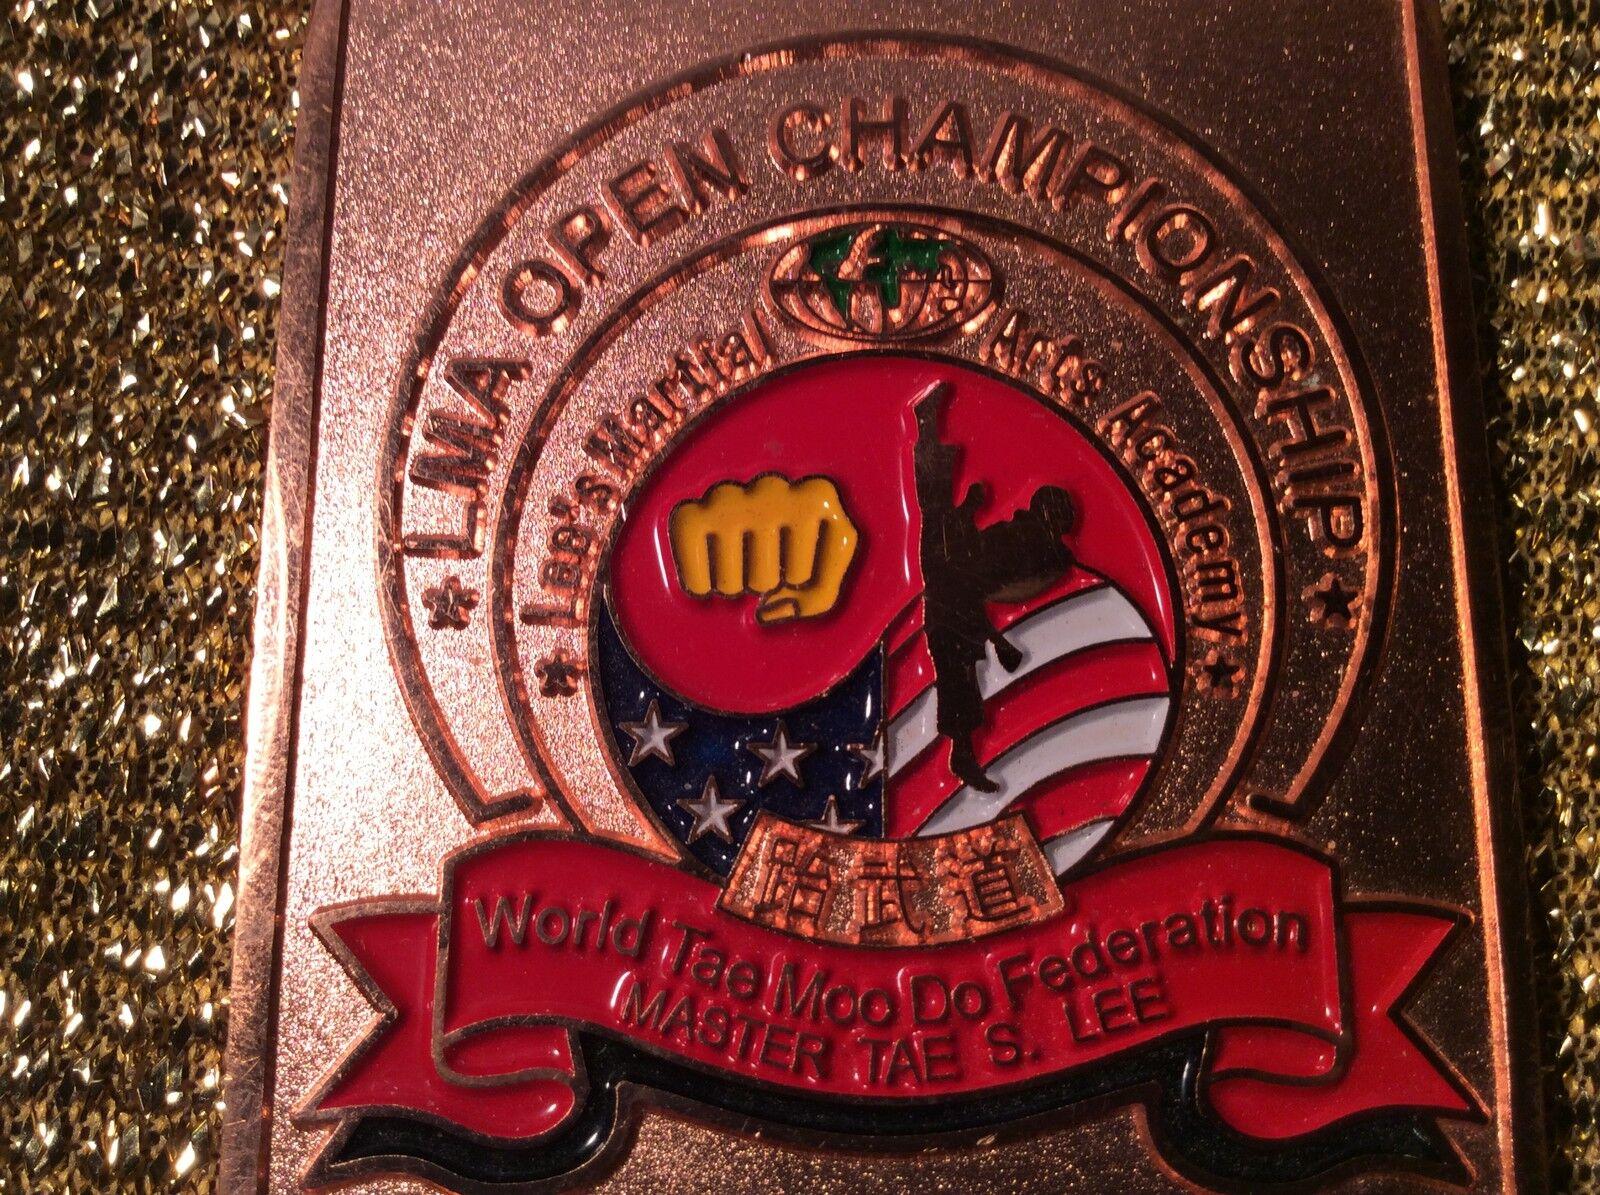 LMA Open Championship Championship Championship World Tae Moo Do Federation Master Tae S. Lee Medal 421d3e